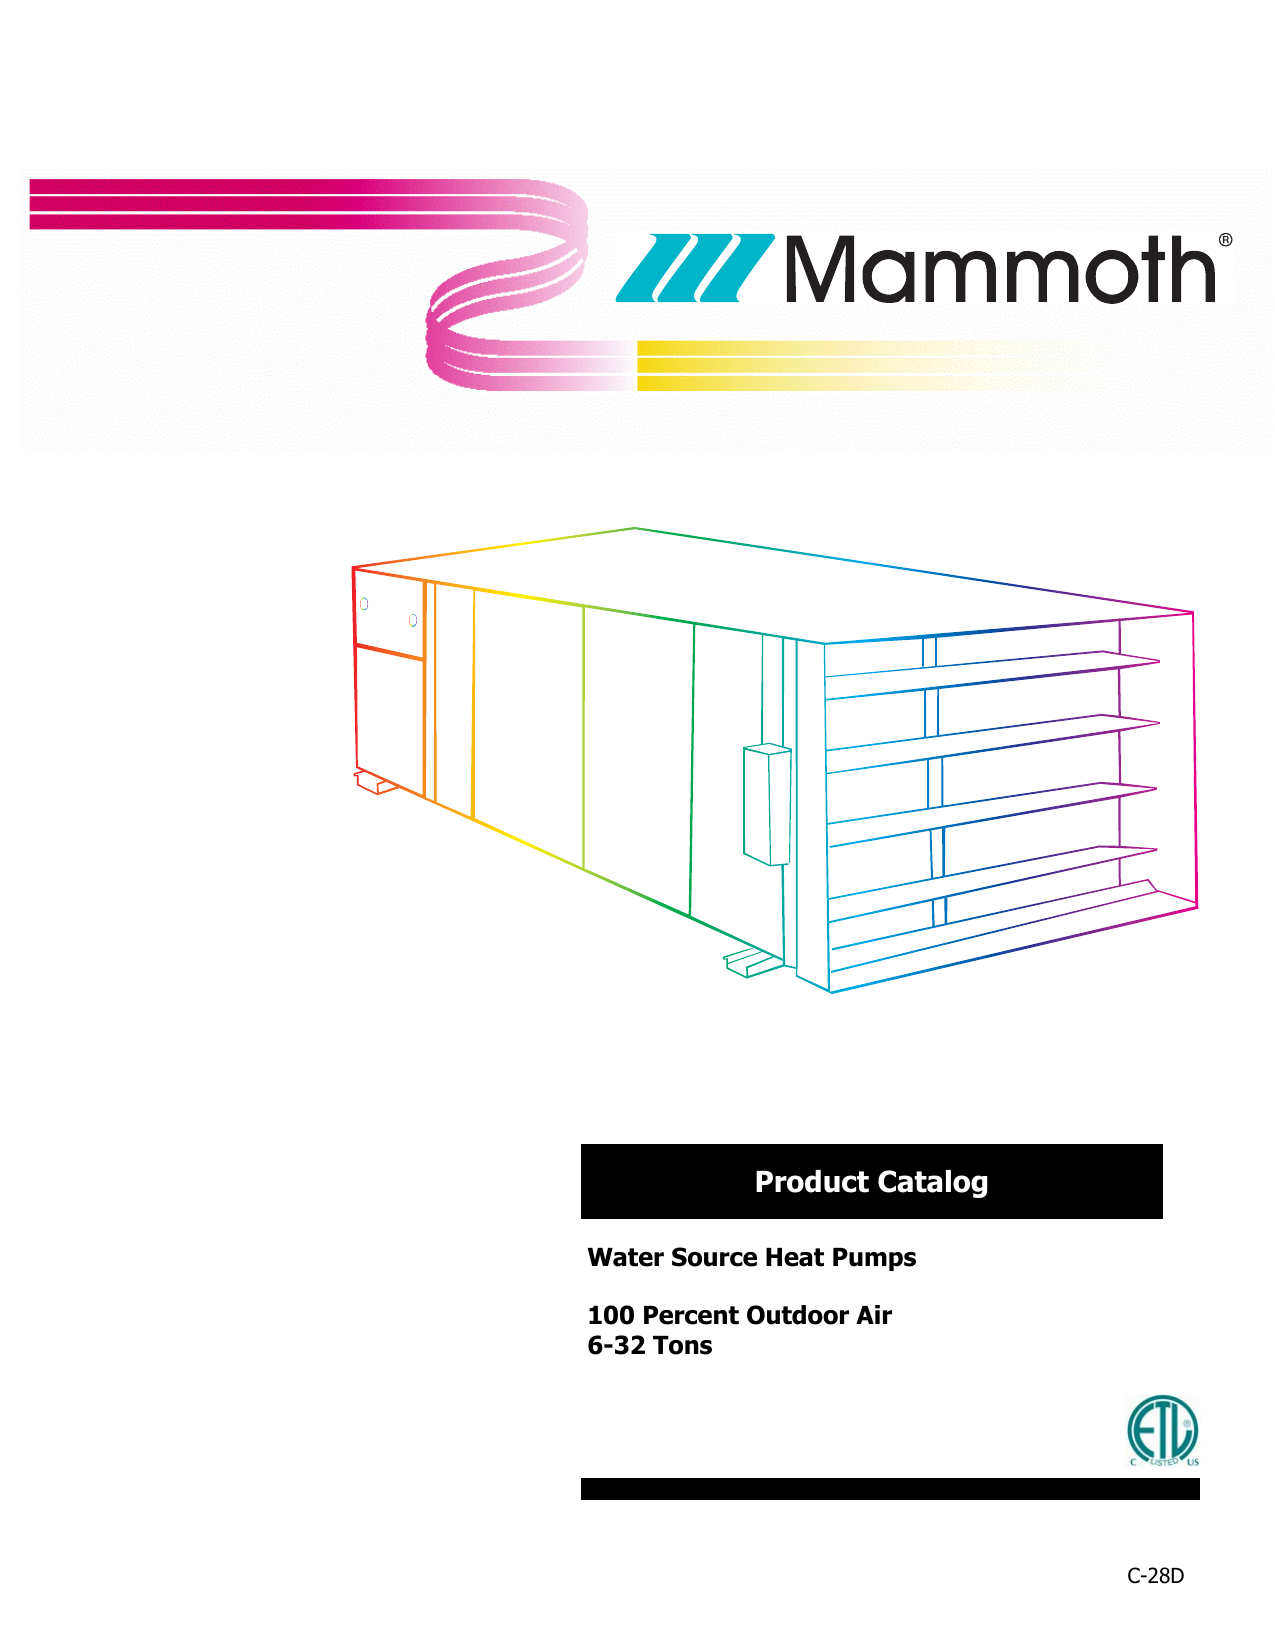 Mammoth C Compressor Wiring Diagram. . Wiring Diagram on